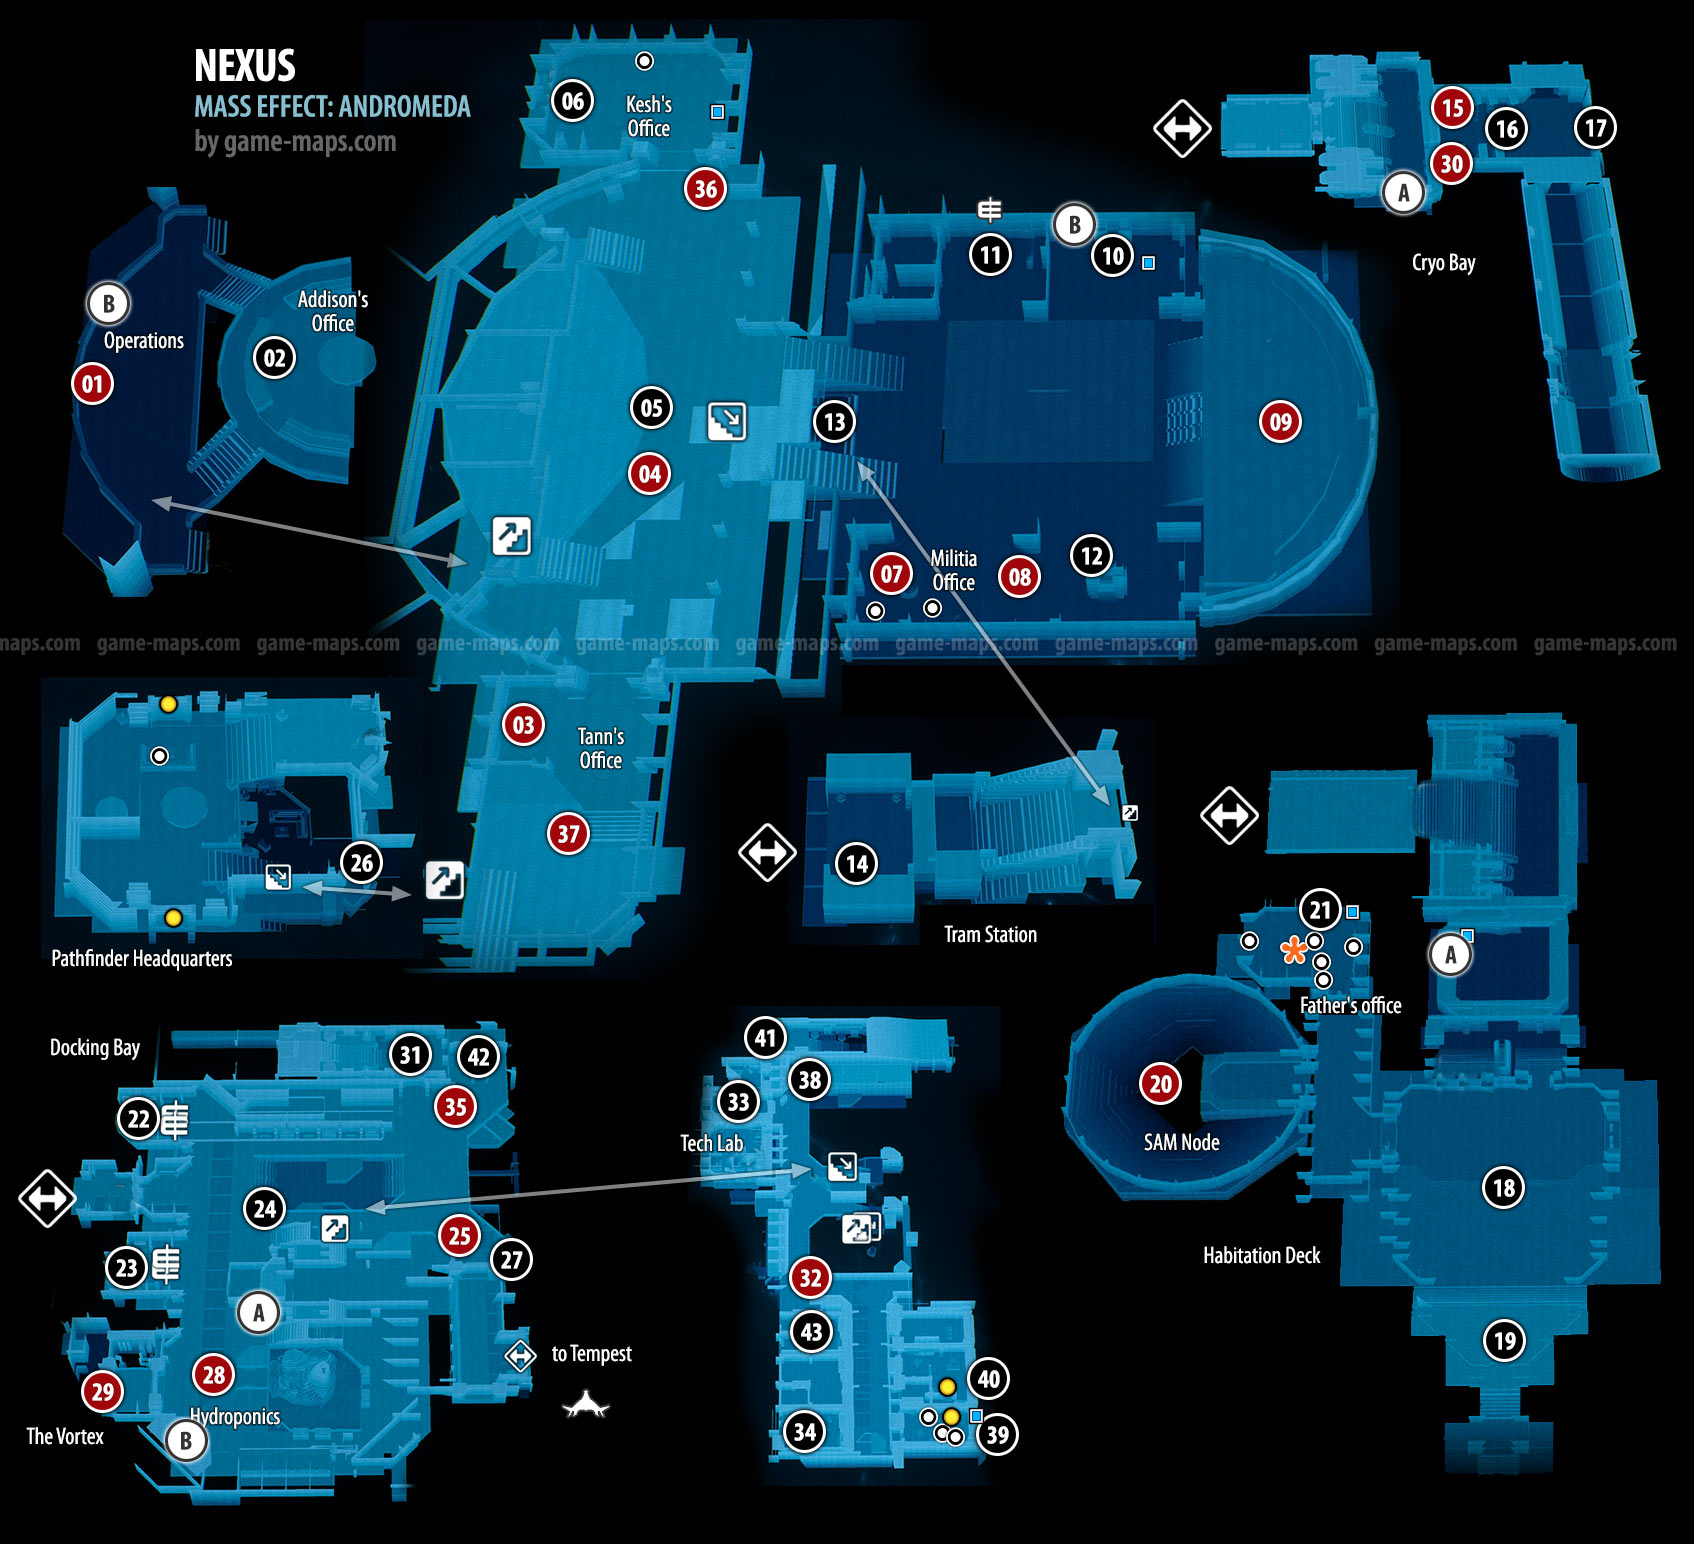 Nexus Mass Effect Andromeda Game Mapscom